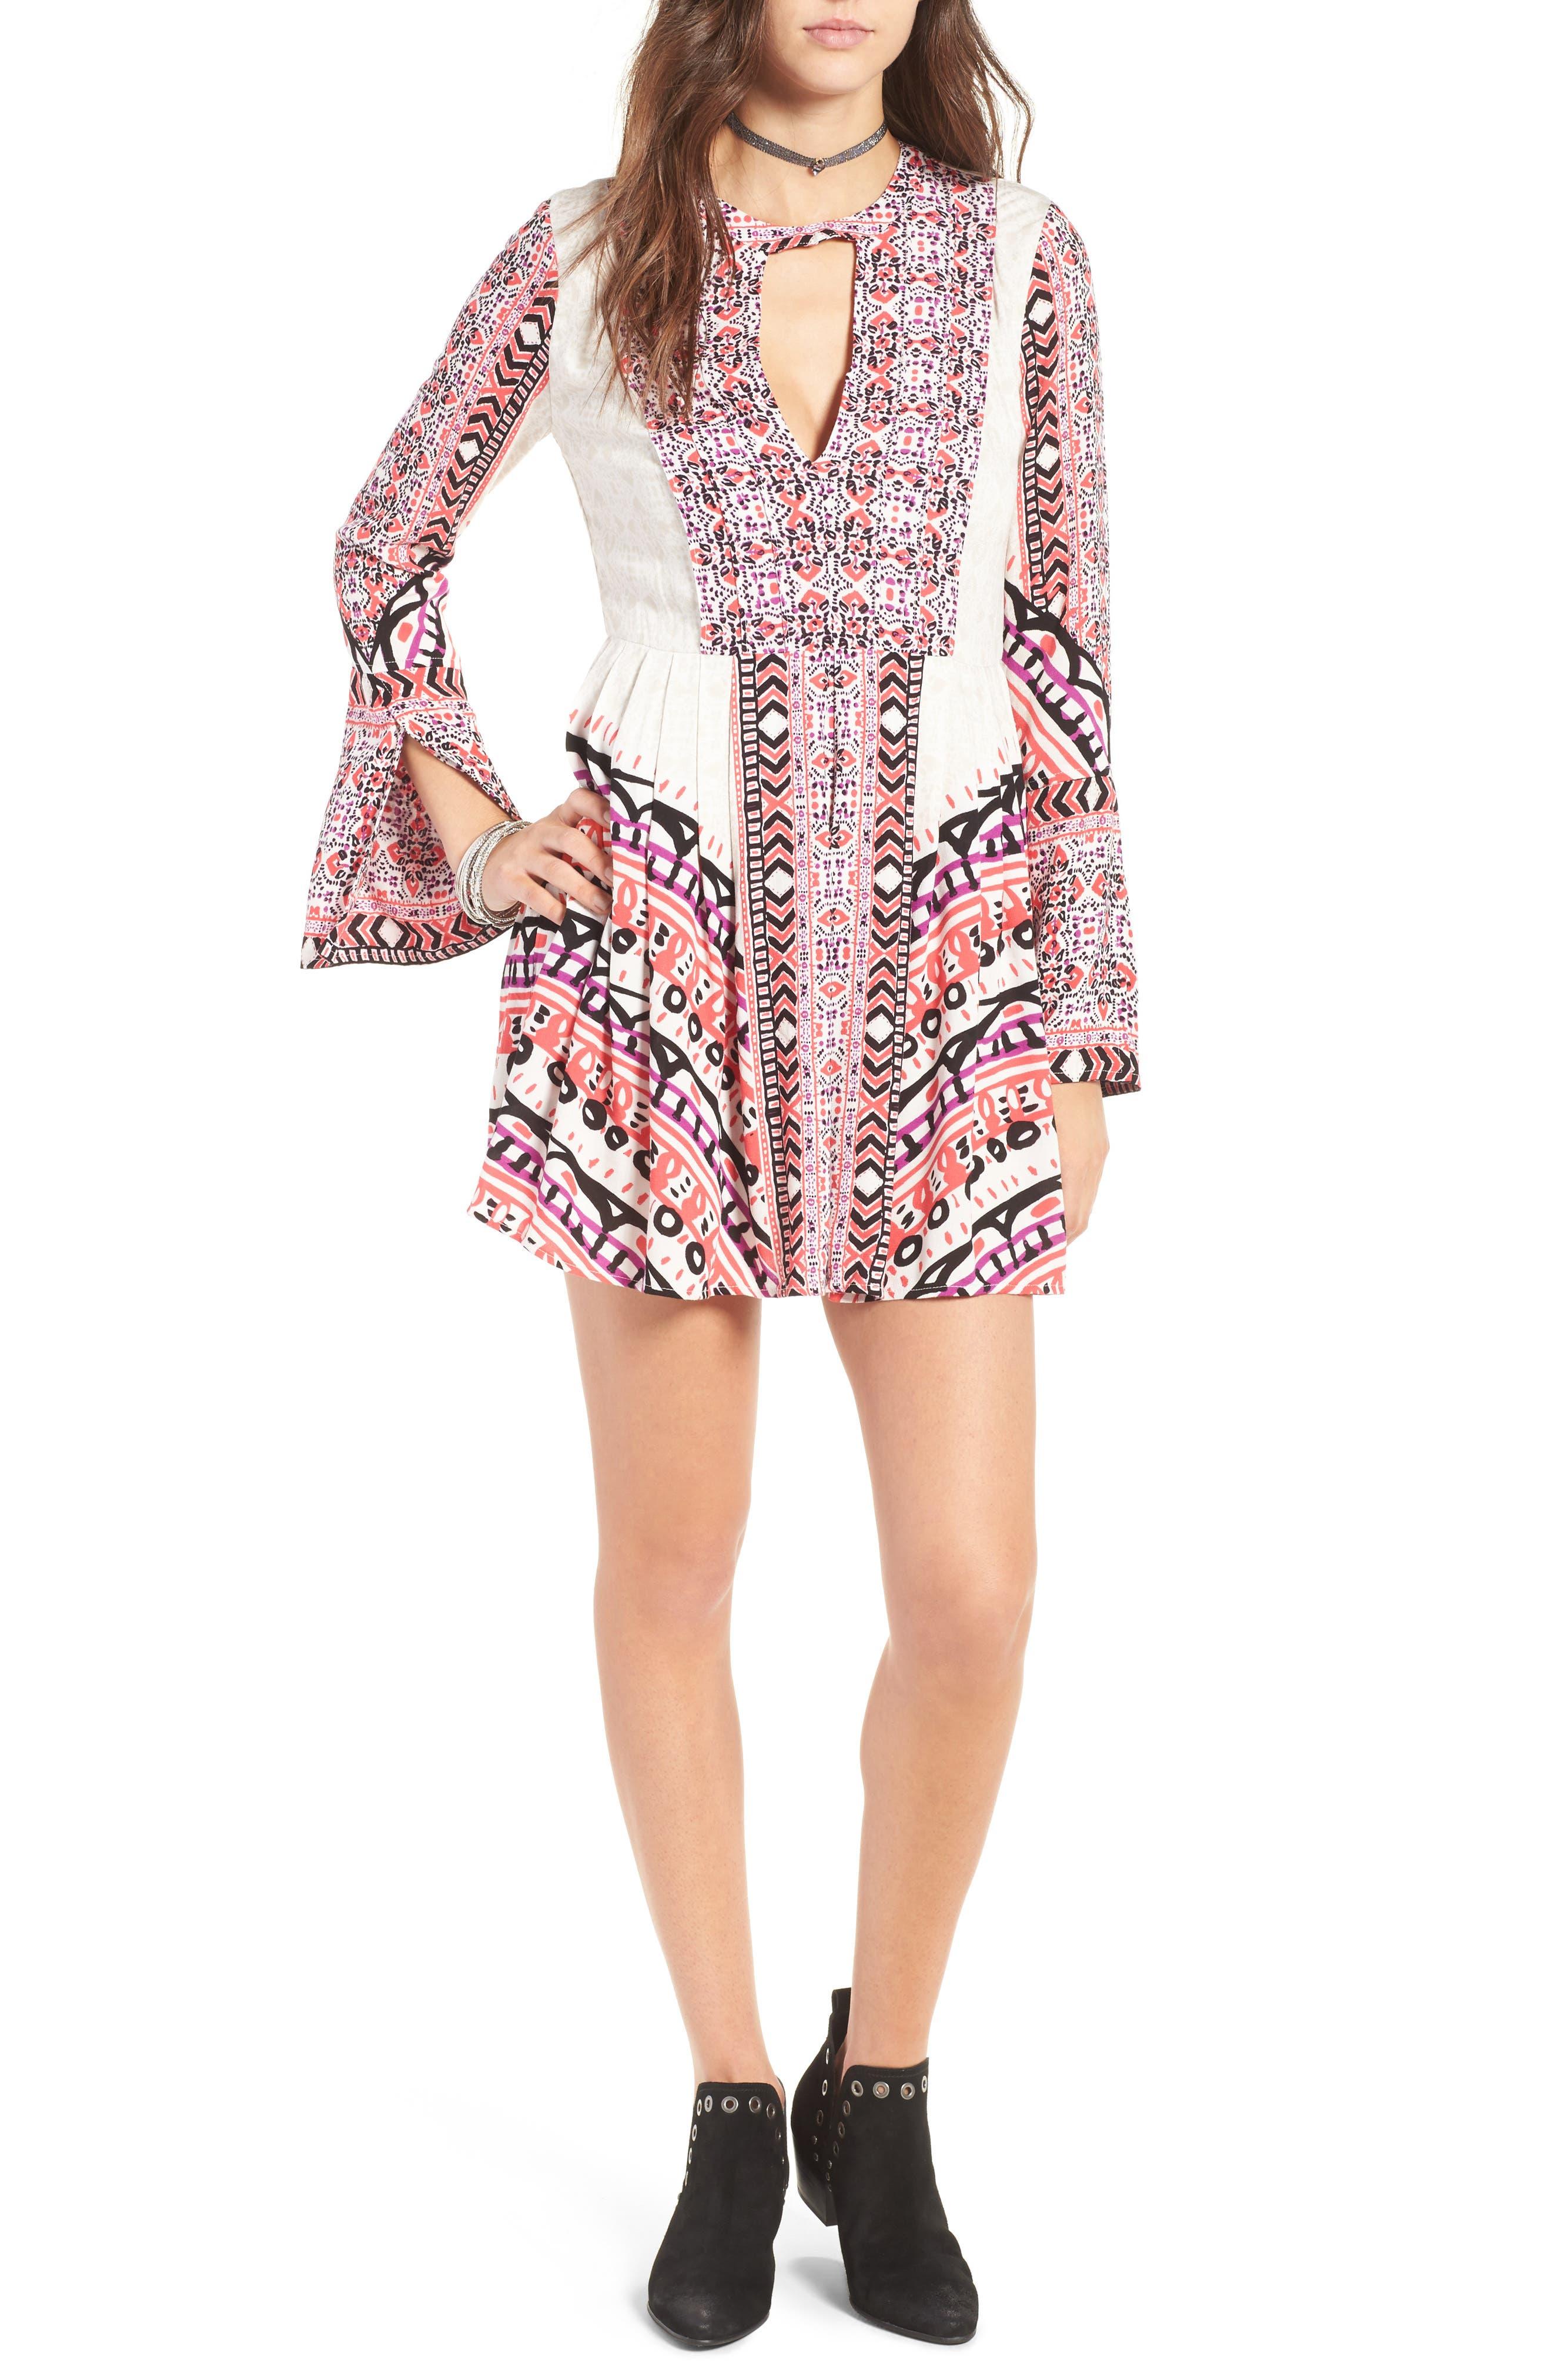 Alternate Image 1 Selected - Free People Tegan Minidress